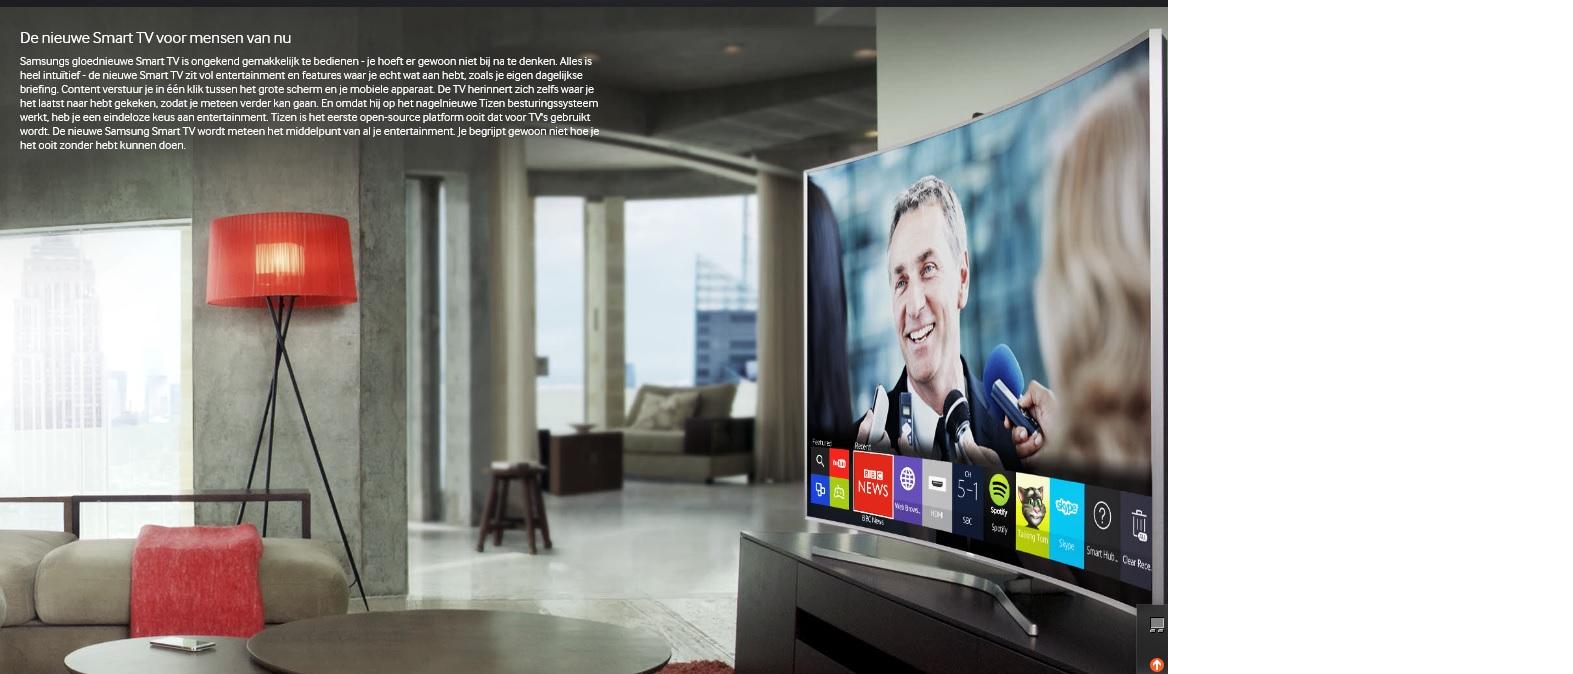 samsung smart tv spotify app download 2015